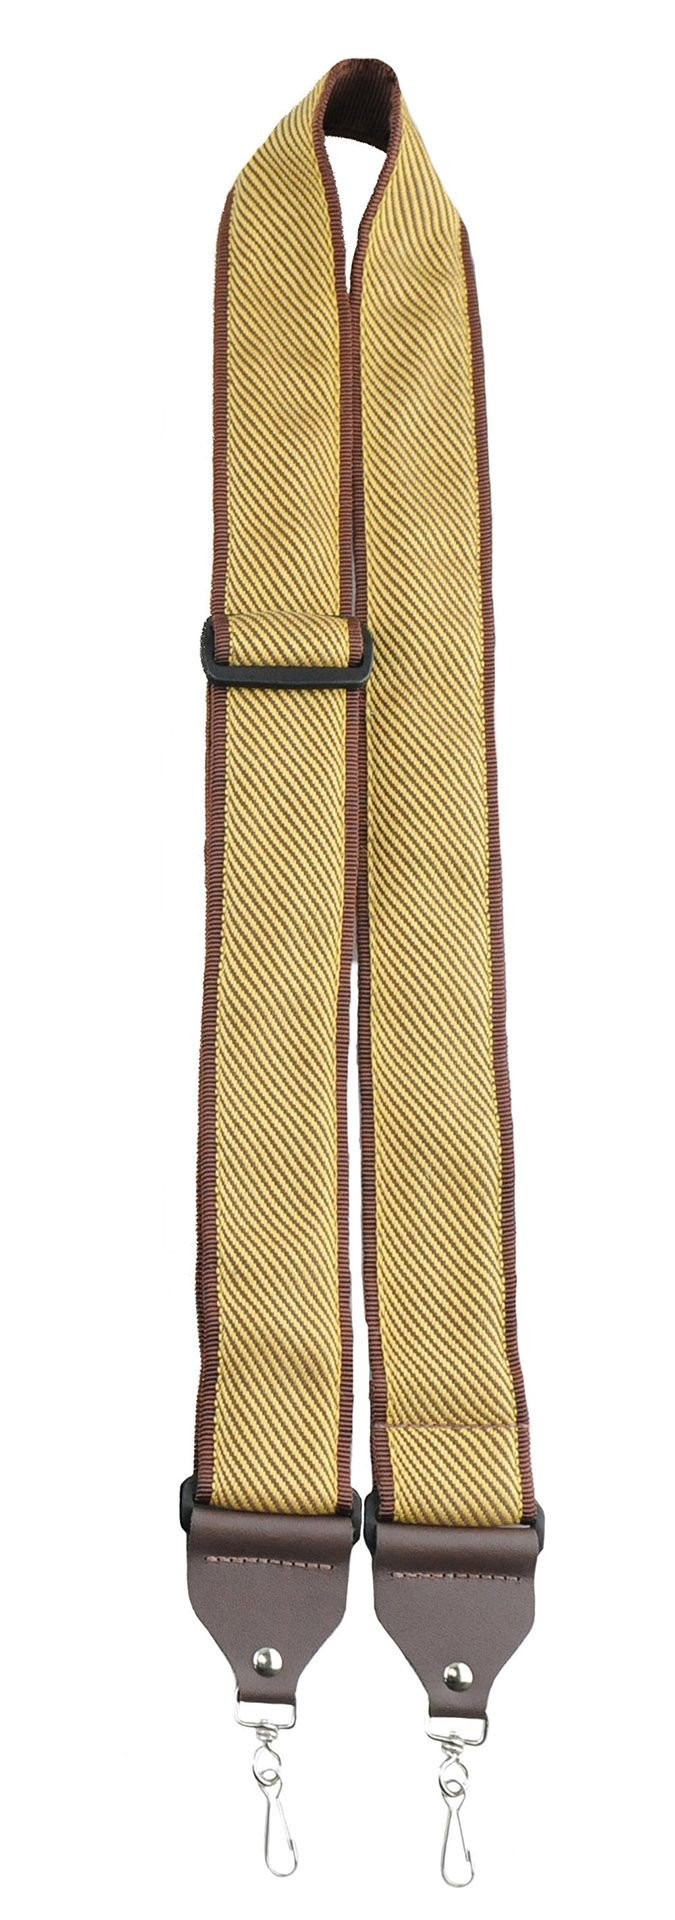 Perris Leathers TWSBJ-6688 Jacquard Banjo Straps